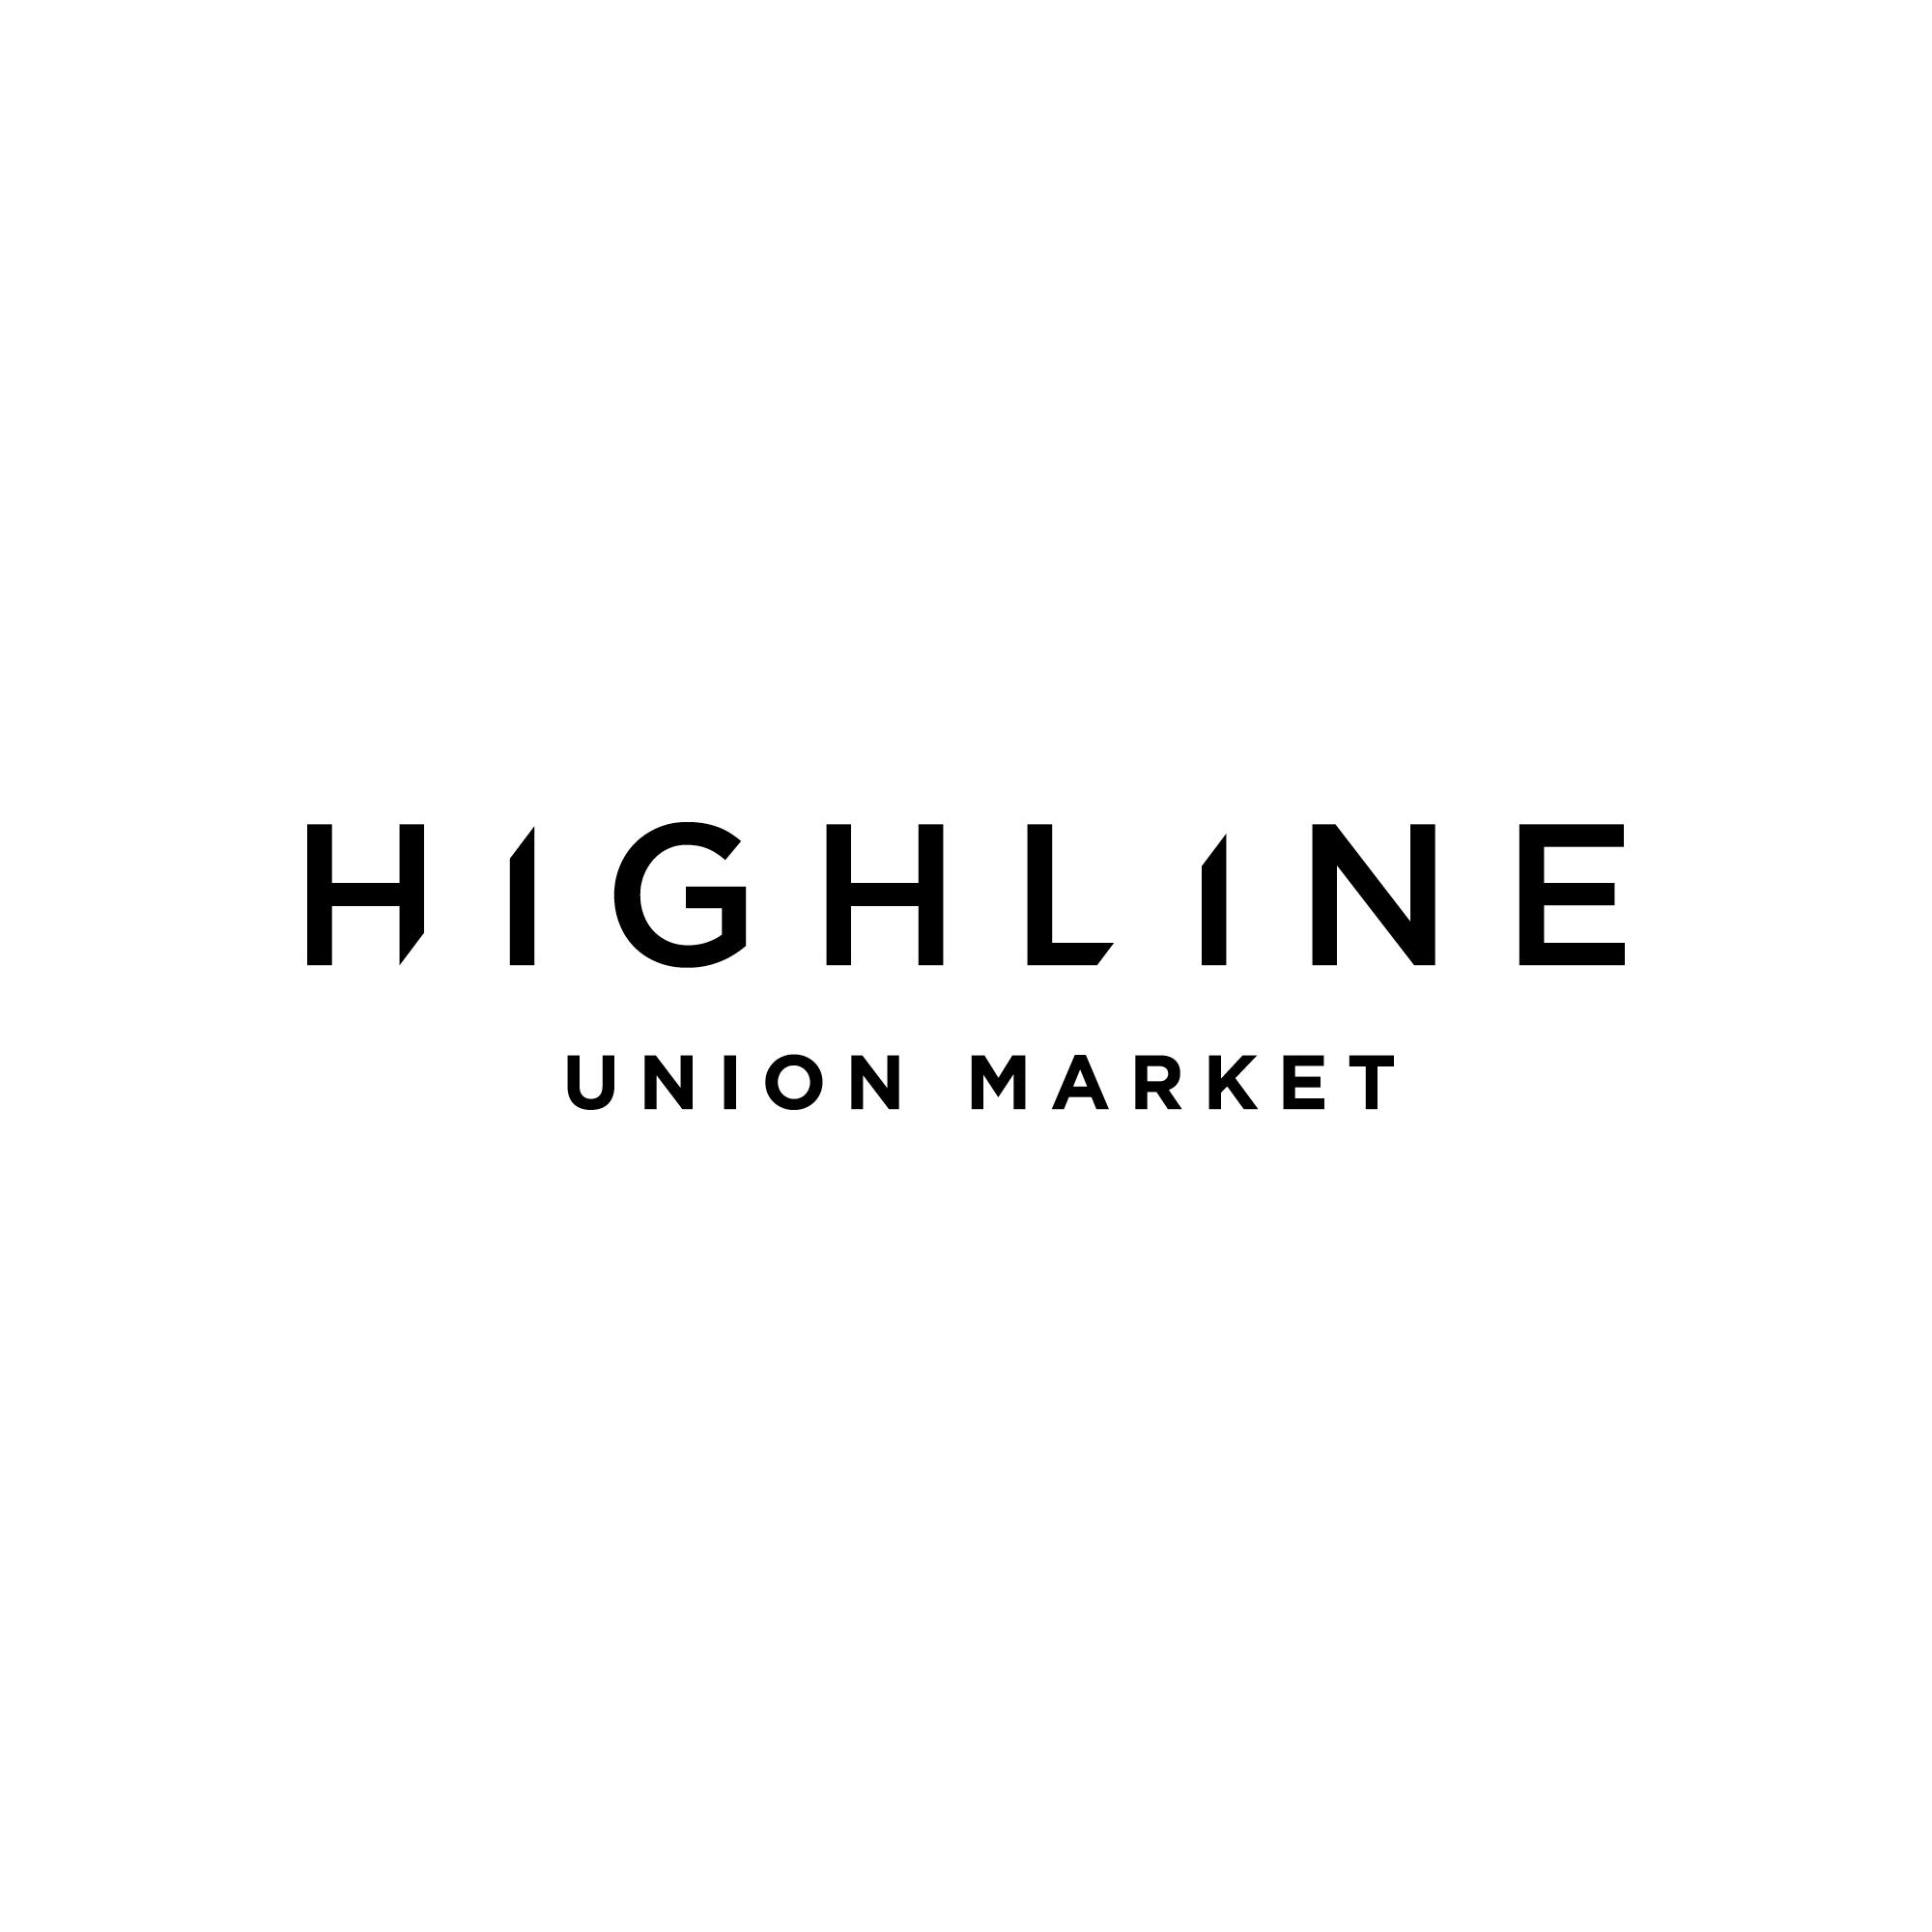 _AkseizerDesignGroup_Highline_Logo.jpg